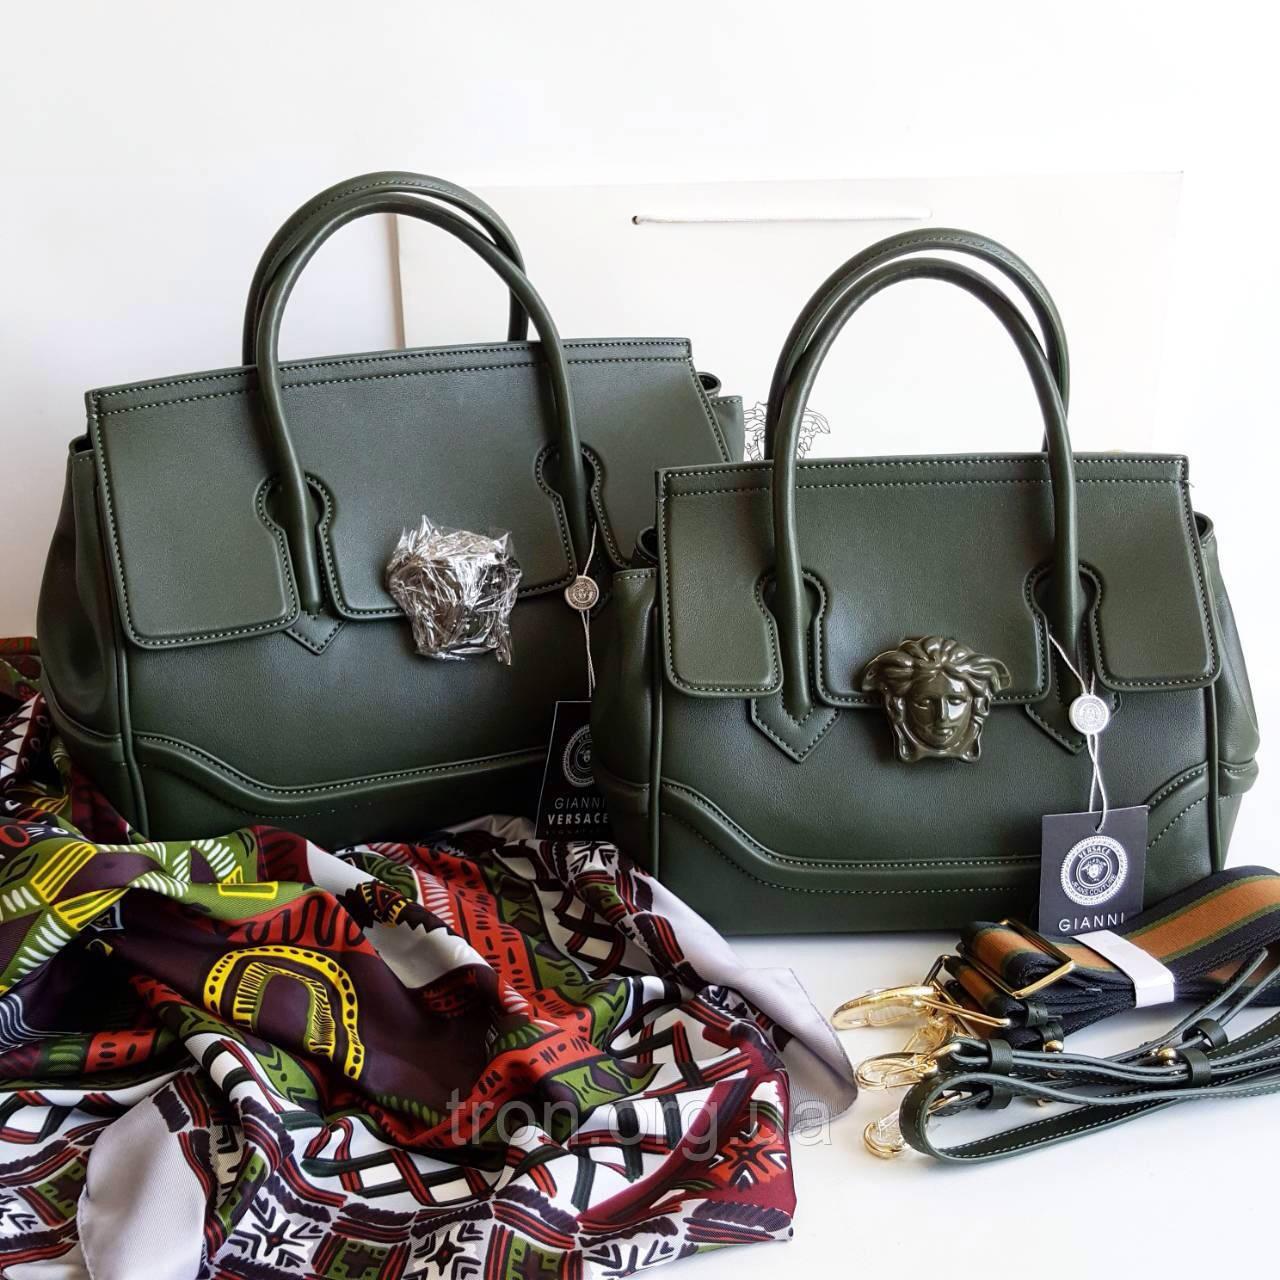 91eb4adfe524 Женская Сумка Versace , цена 2 495 грн., купить в Харькове — Prom.ua  (ID#603628259)